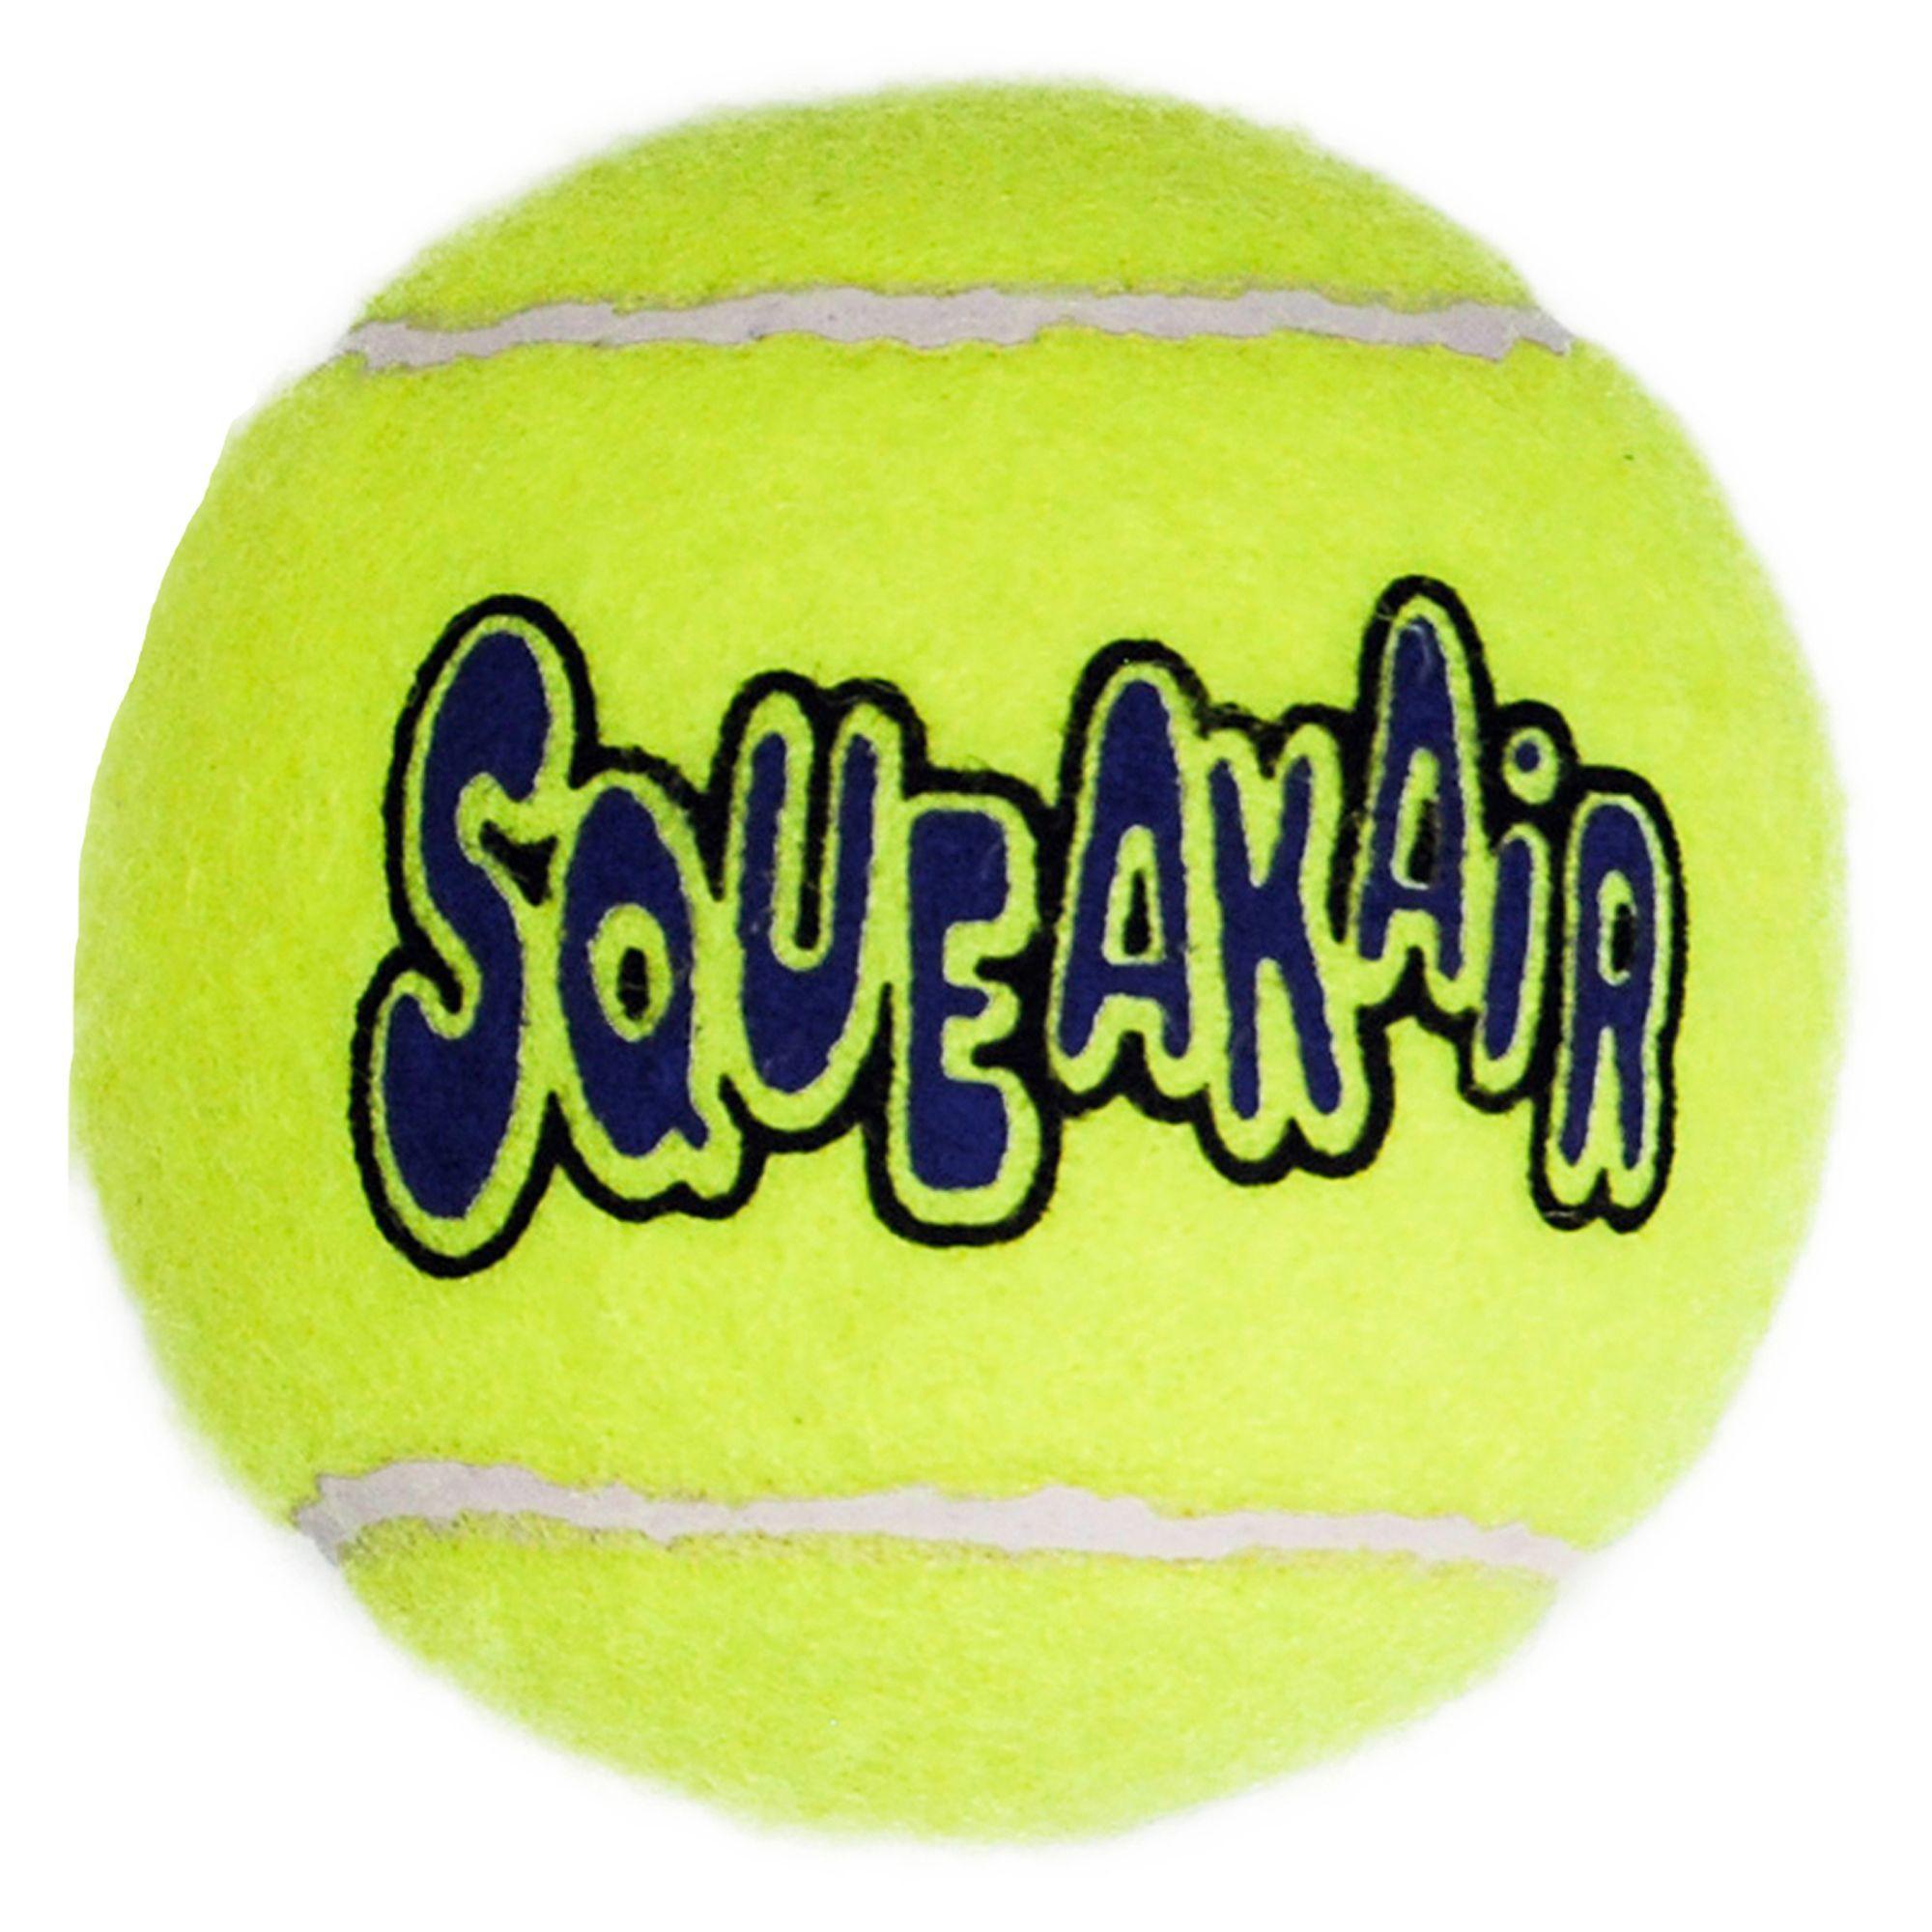 Kong Airdog Tennis Ball Squeaker Dog Toy Size Large Yellow